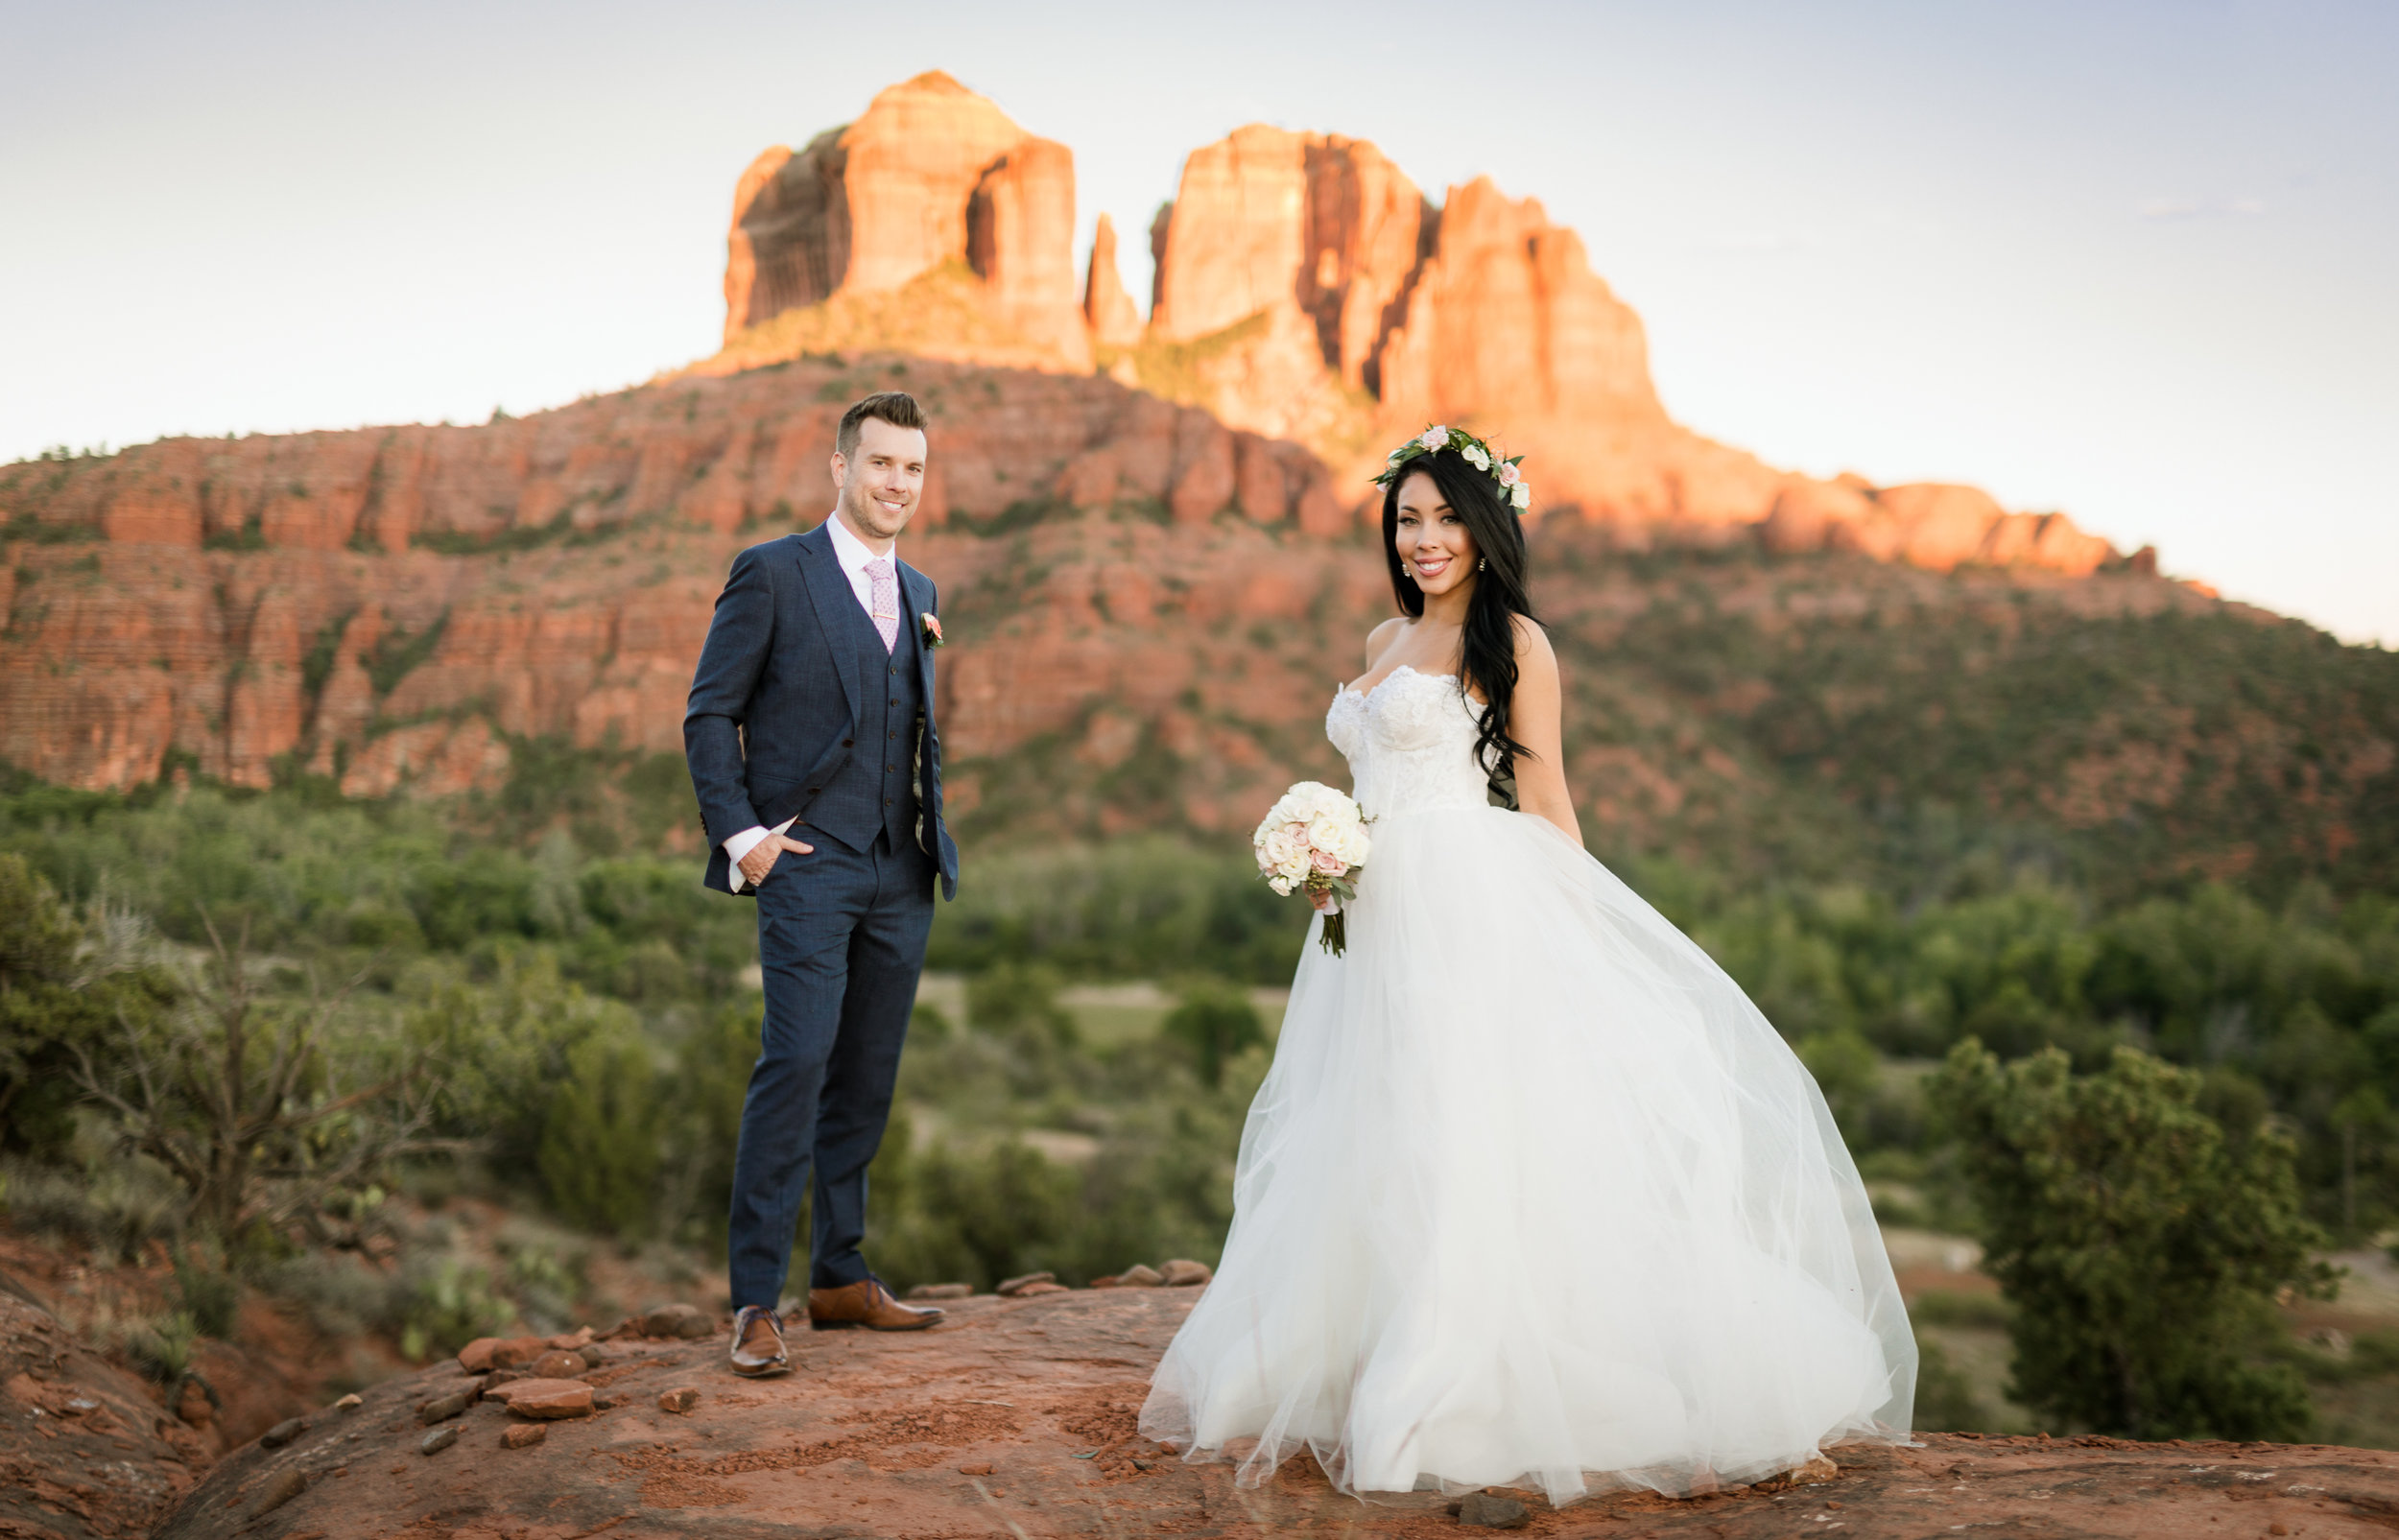 LMW-Sedona-lauberge-wedding--2.jpg